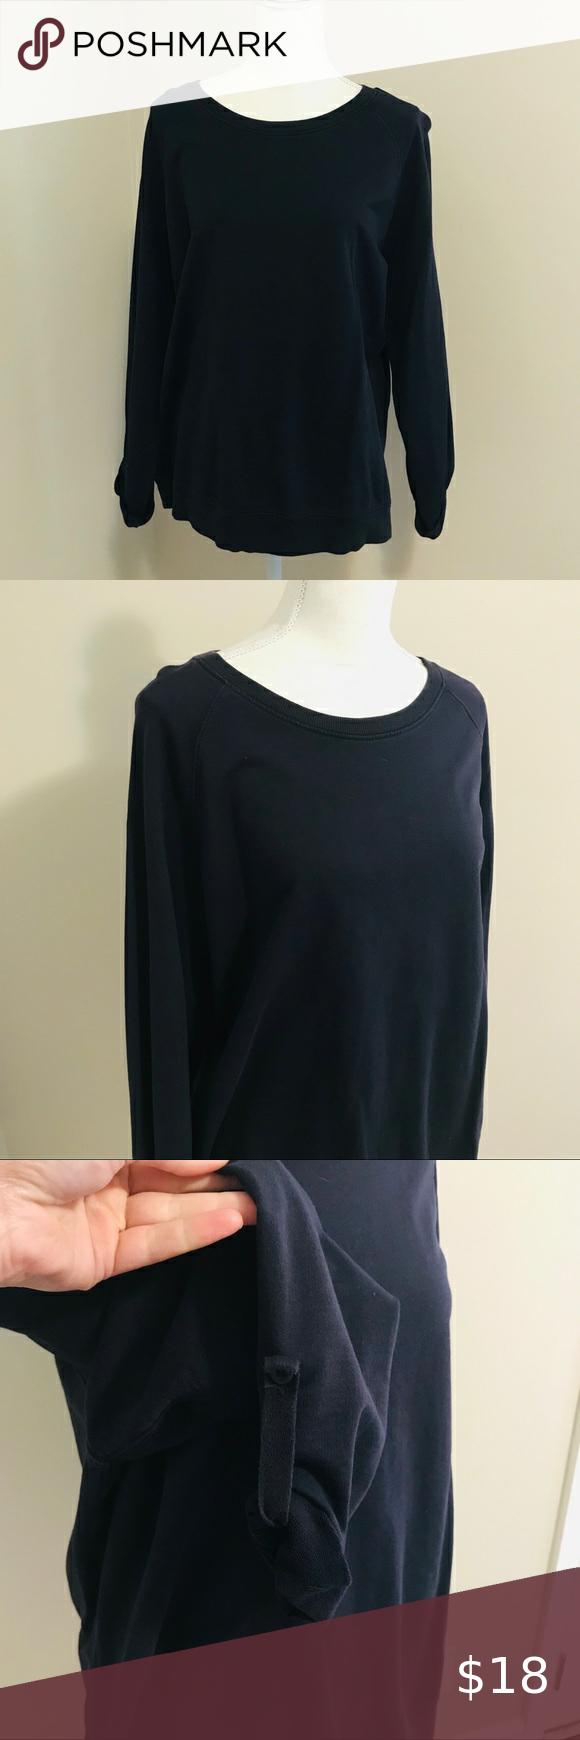 Lands End Roll Sleeve Crewneck Sweatshirt How To Roll Sleeves Crew Neck Sweatshirt Navy Blue Sweatshirt [ 1740 x 580 Pixel ]